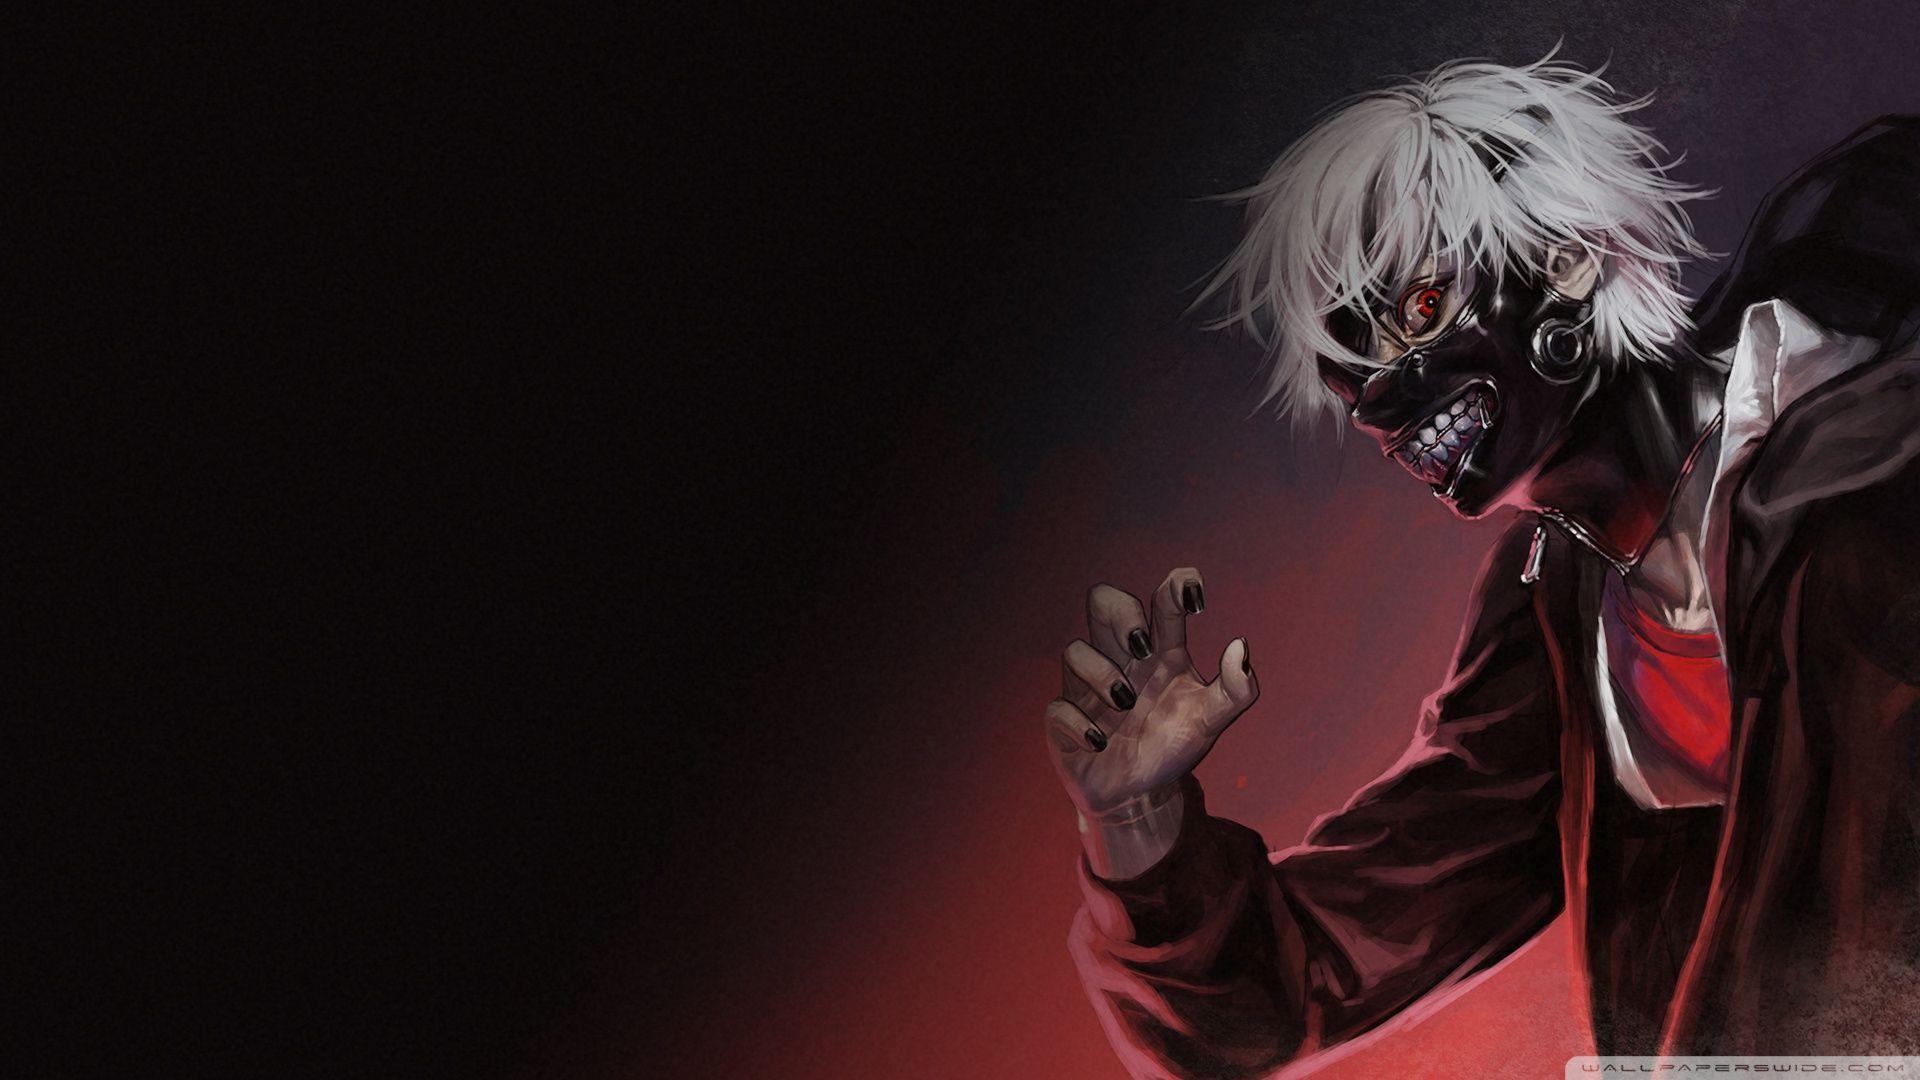 Tokyo Ghoul Desktop Wallpapers Top Free Tokyo Ghoul Desktop Backgrounds Wallpaperaccess